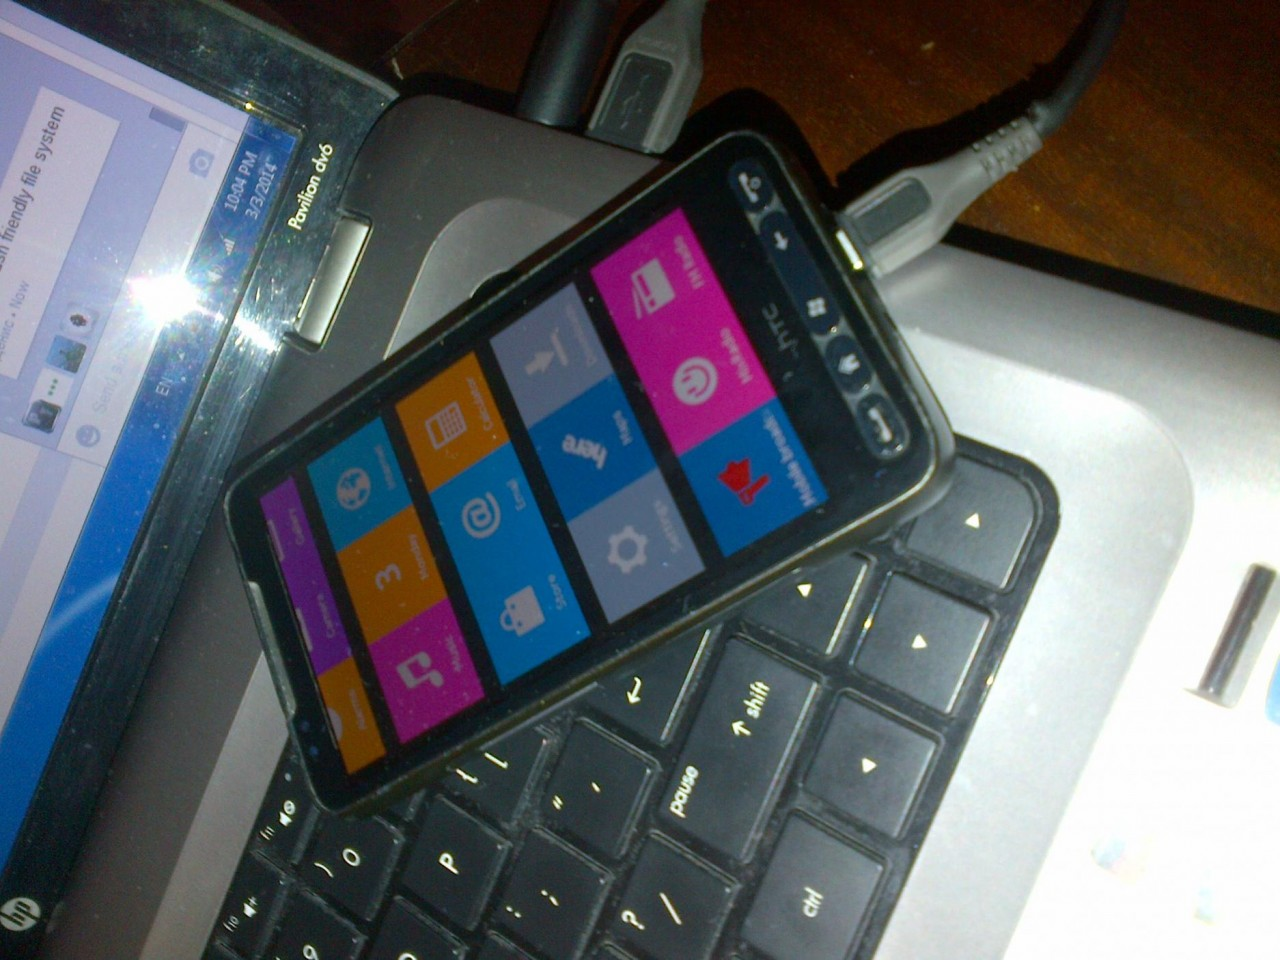 HTC HD2